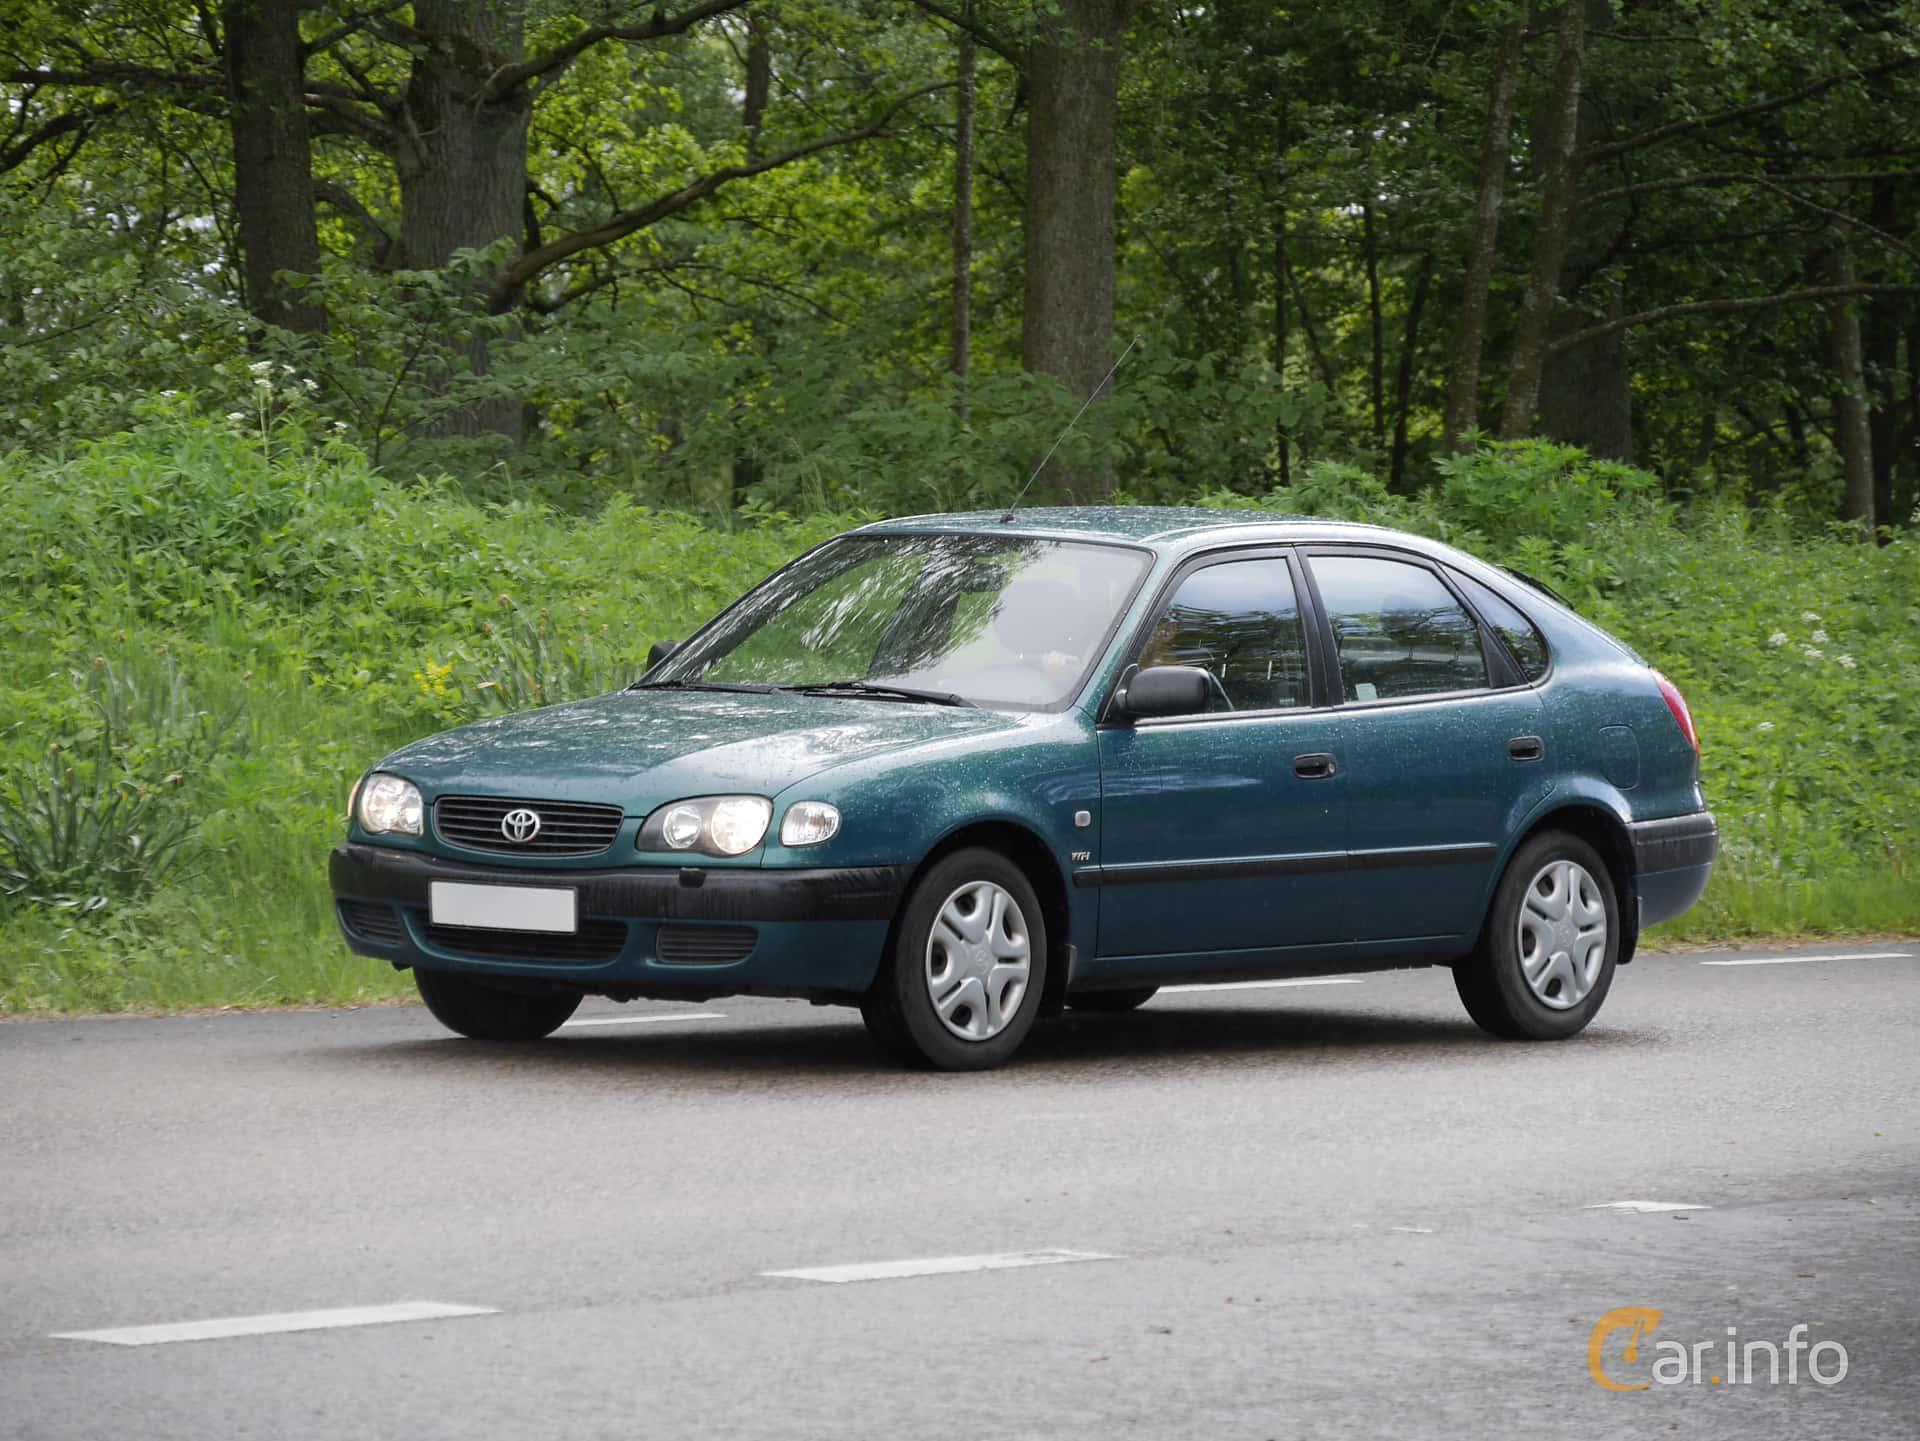 Kekurangan Toyota 2001 Review